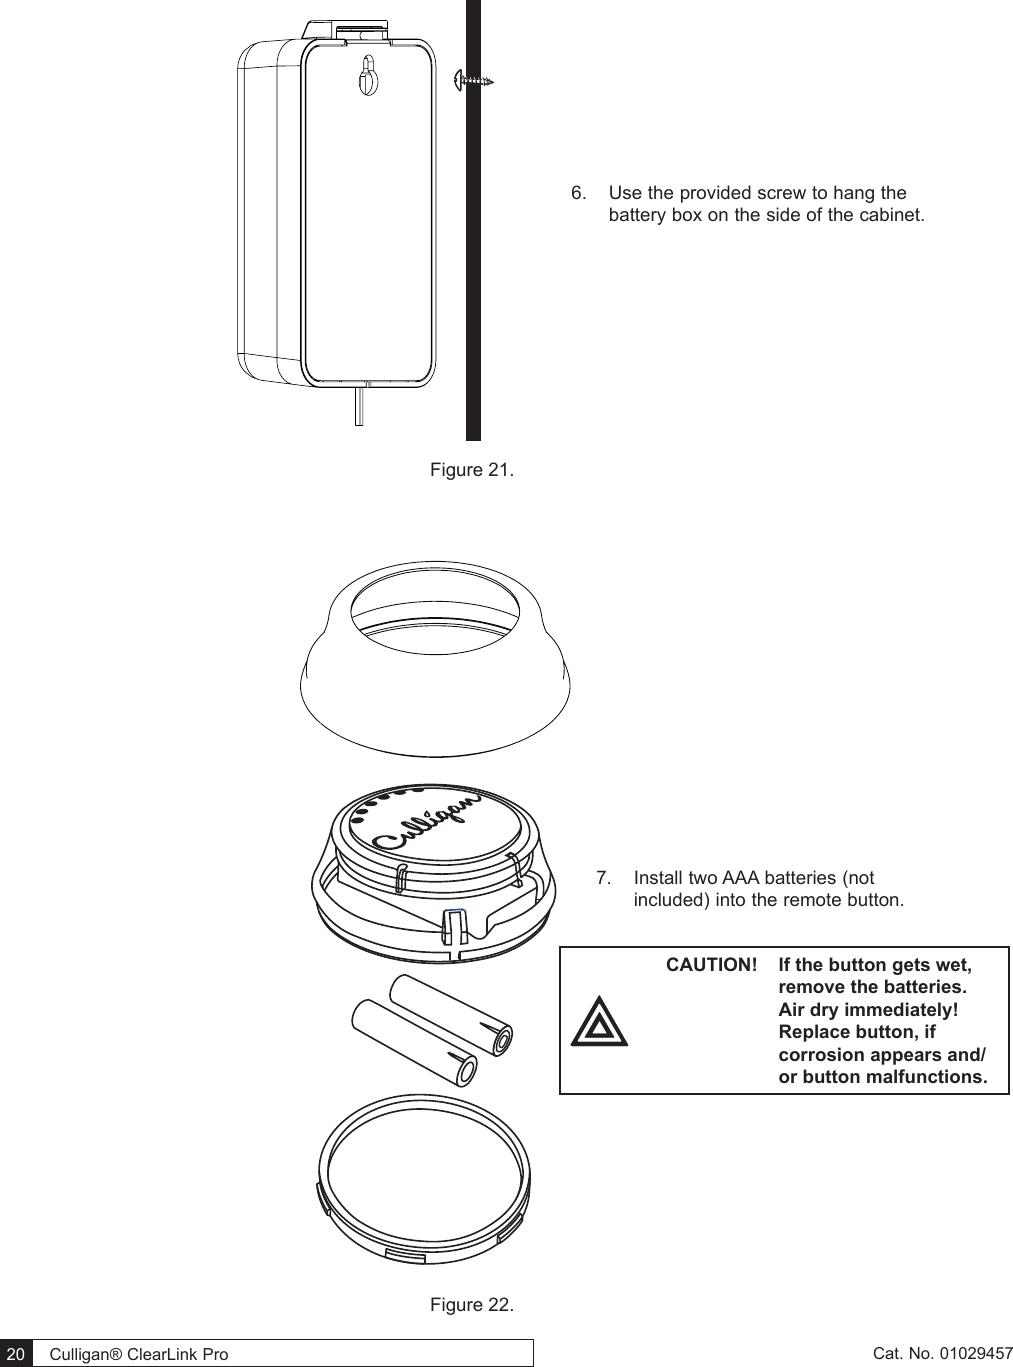 Culligan 010330CL Wireless Filtration Control User Manual